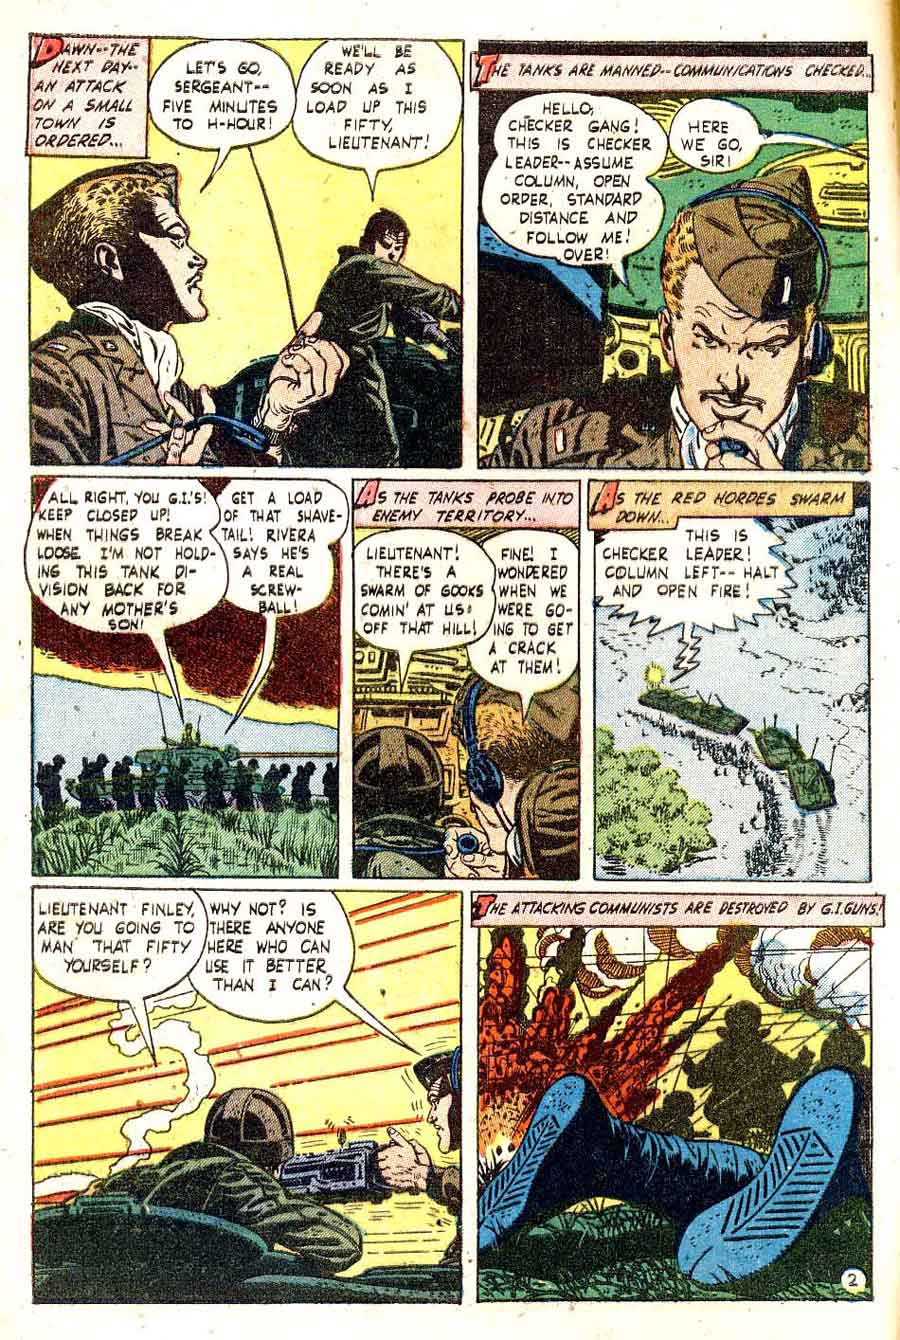 Battlefront v1 #5 golden age war standard comic book page art by Alex Toth